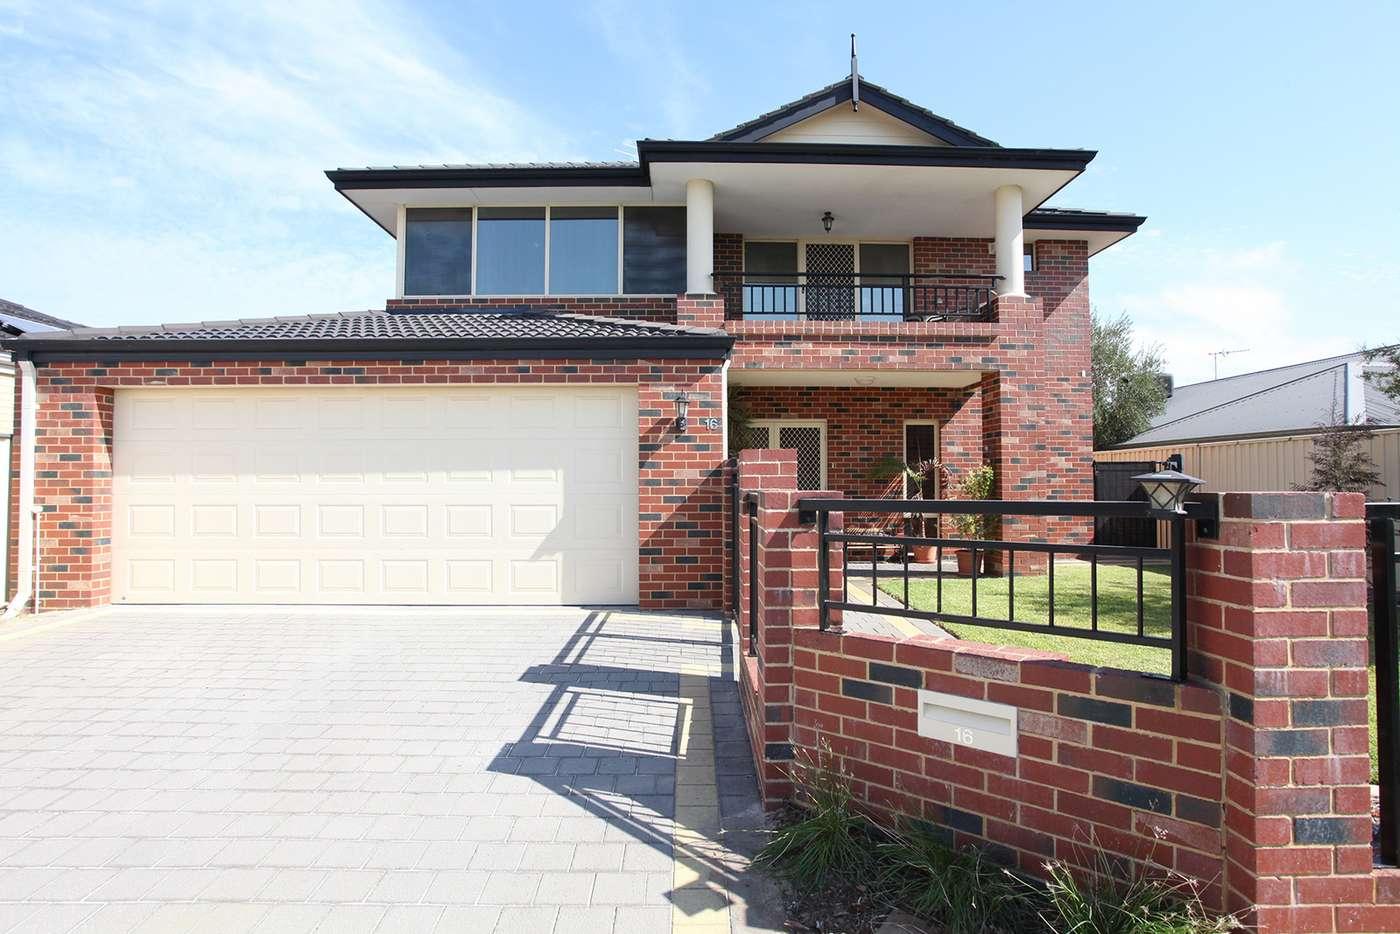 Main view of Homely house listing, 16 Burdekin Vista, Hammond Park WA 6164